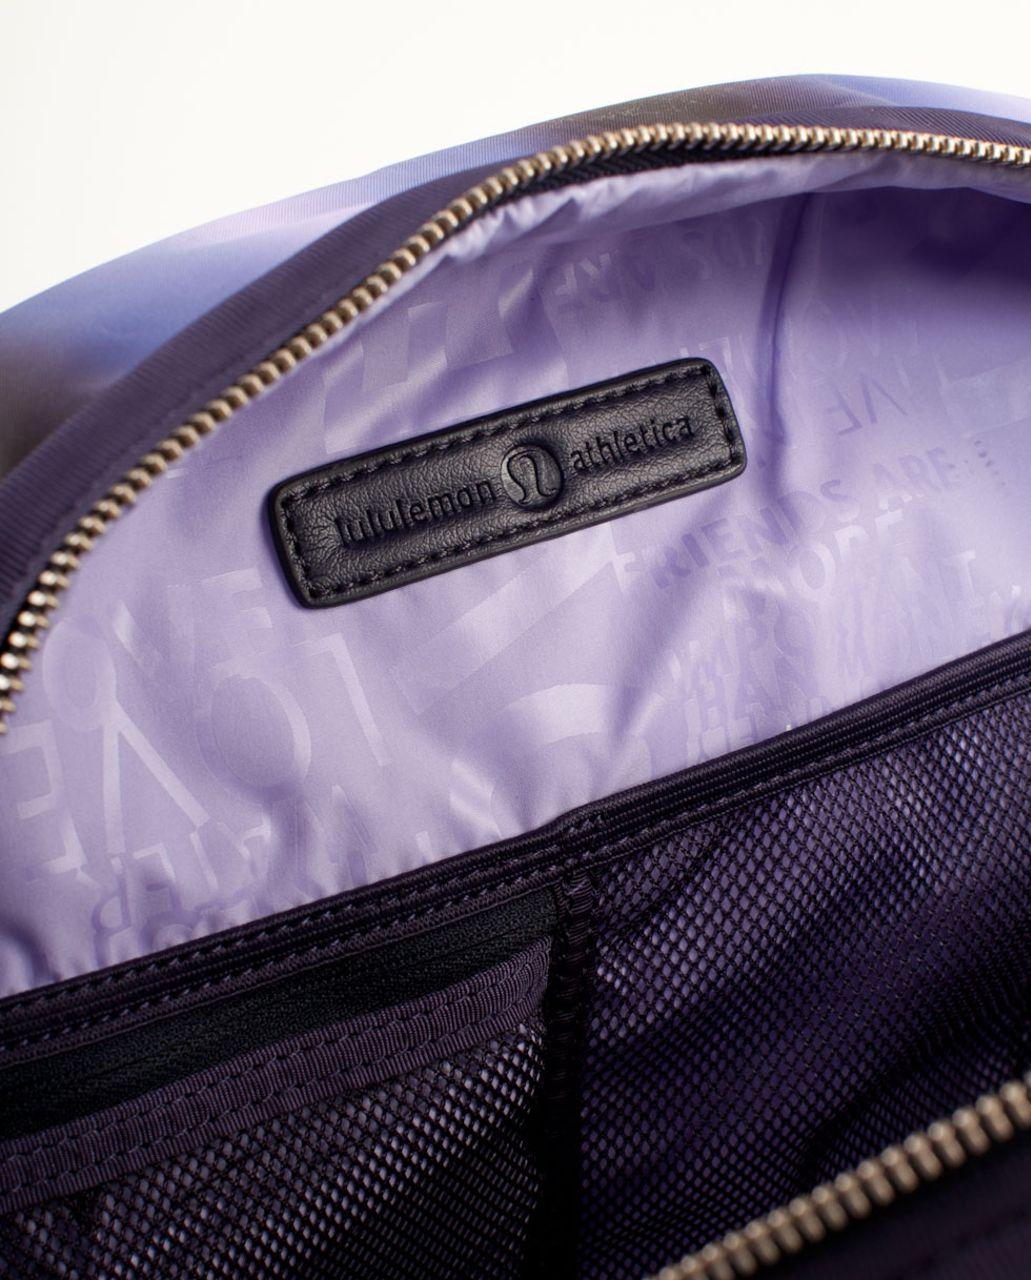 Lululemon Still Groovy Bag - Black Swan Persian Purple Lilac Gradient